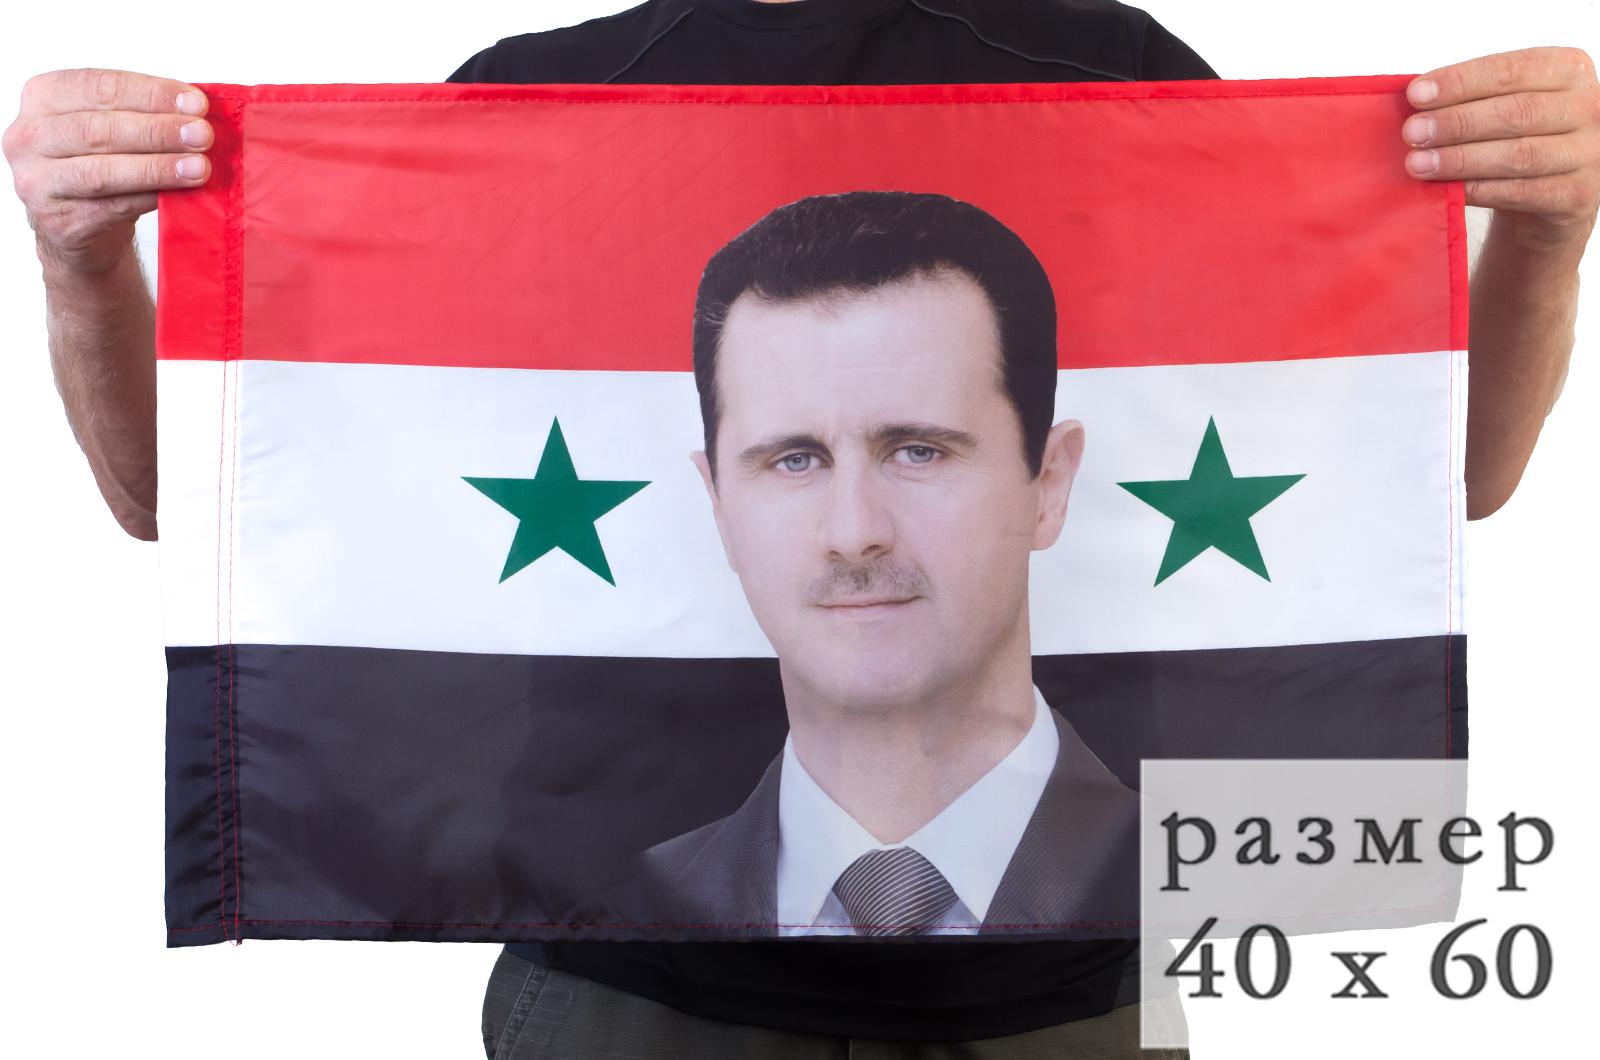 Сирийский флаг с Асадом 40x60